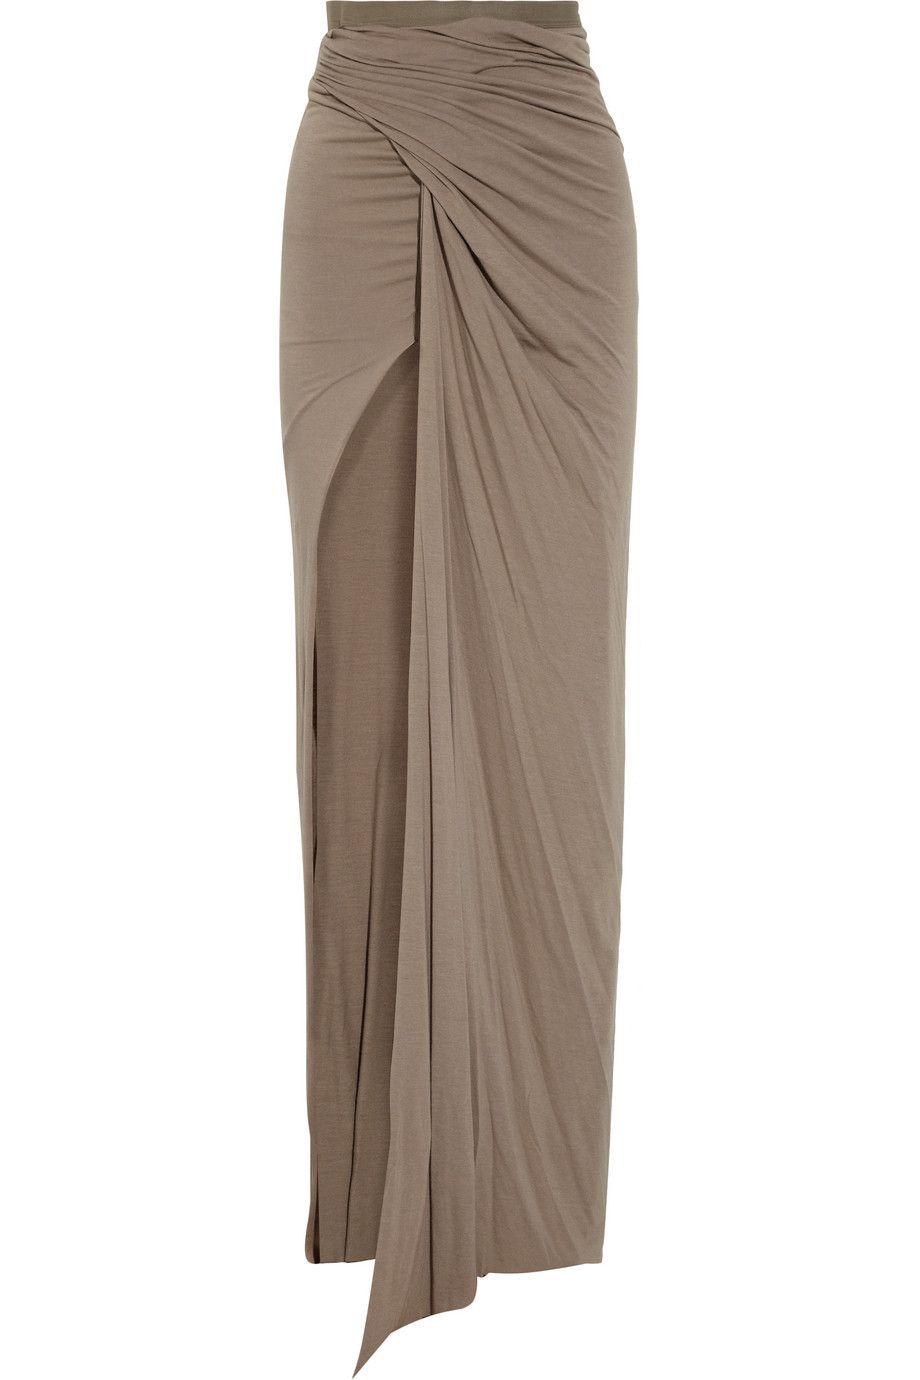 Rick Owens Lilies - Draped stretch-jersey maxi skirt